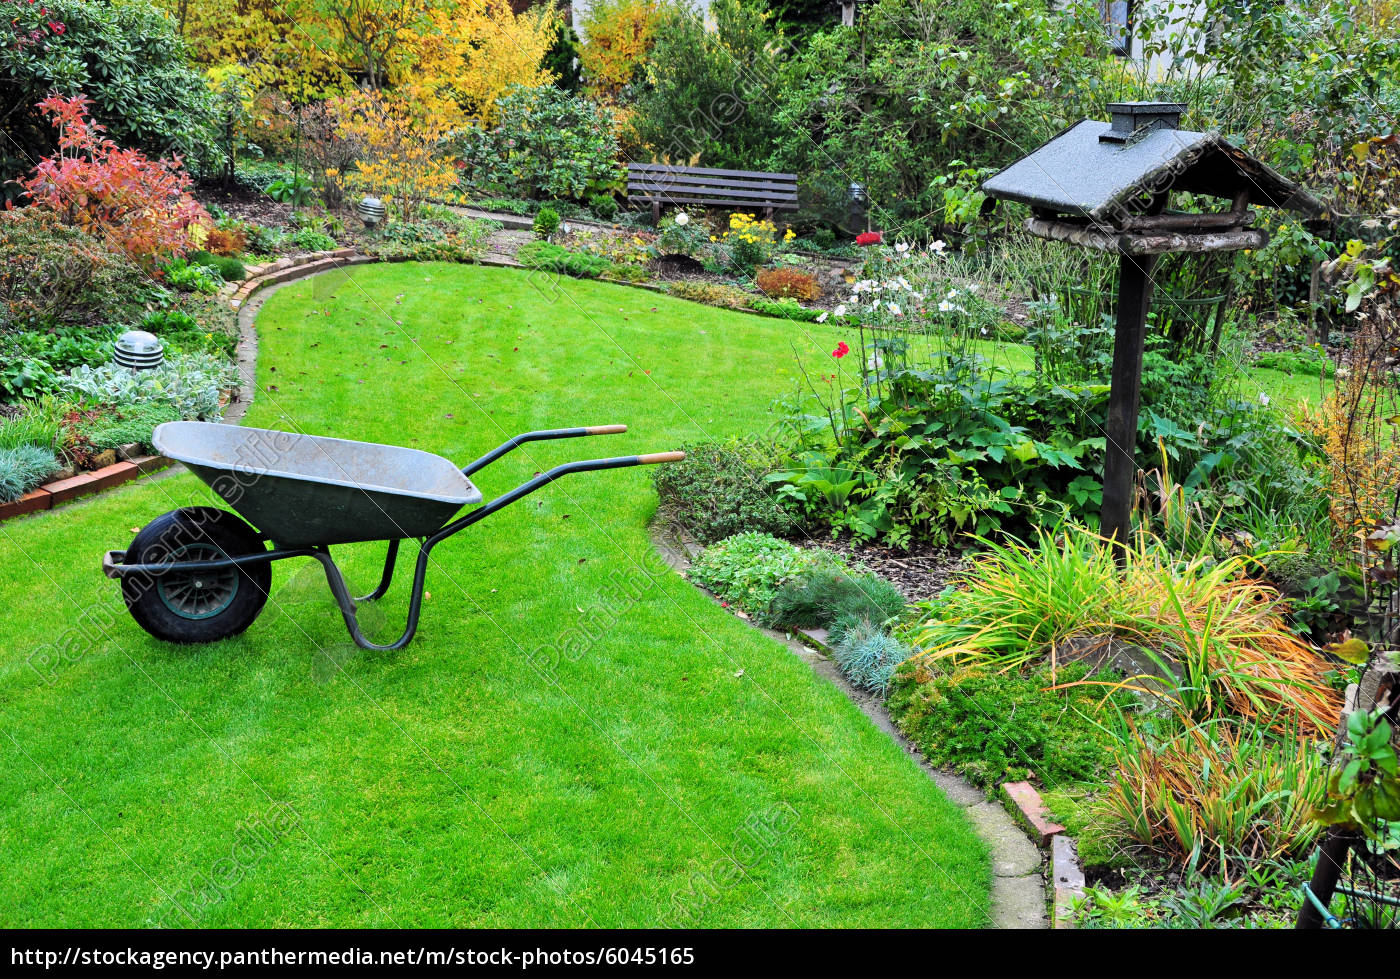 gartenarbeit mit schubkarre im herbstgarten stockfoto 6045165 bildagentur panthermedia. Black Bedroom Furniture Sets. Home Design Ideas